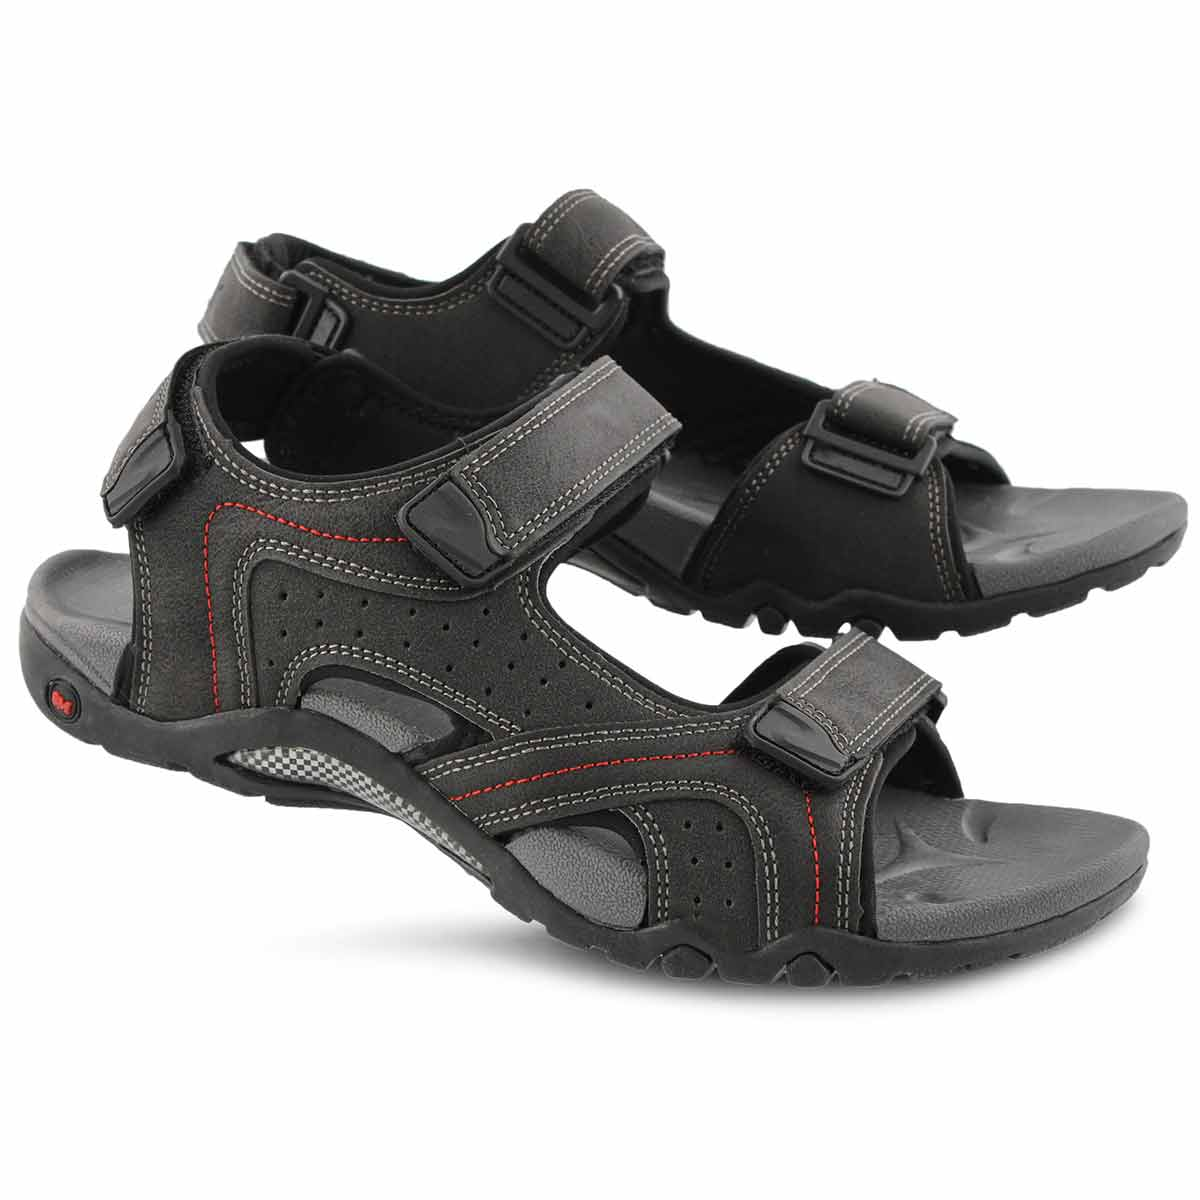 Sandale sport 3brides, Kraznys2, nr, hom